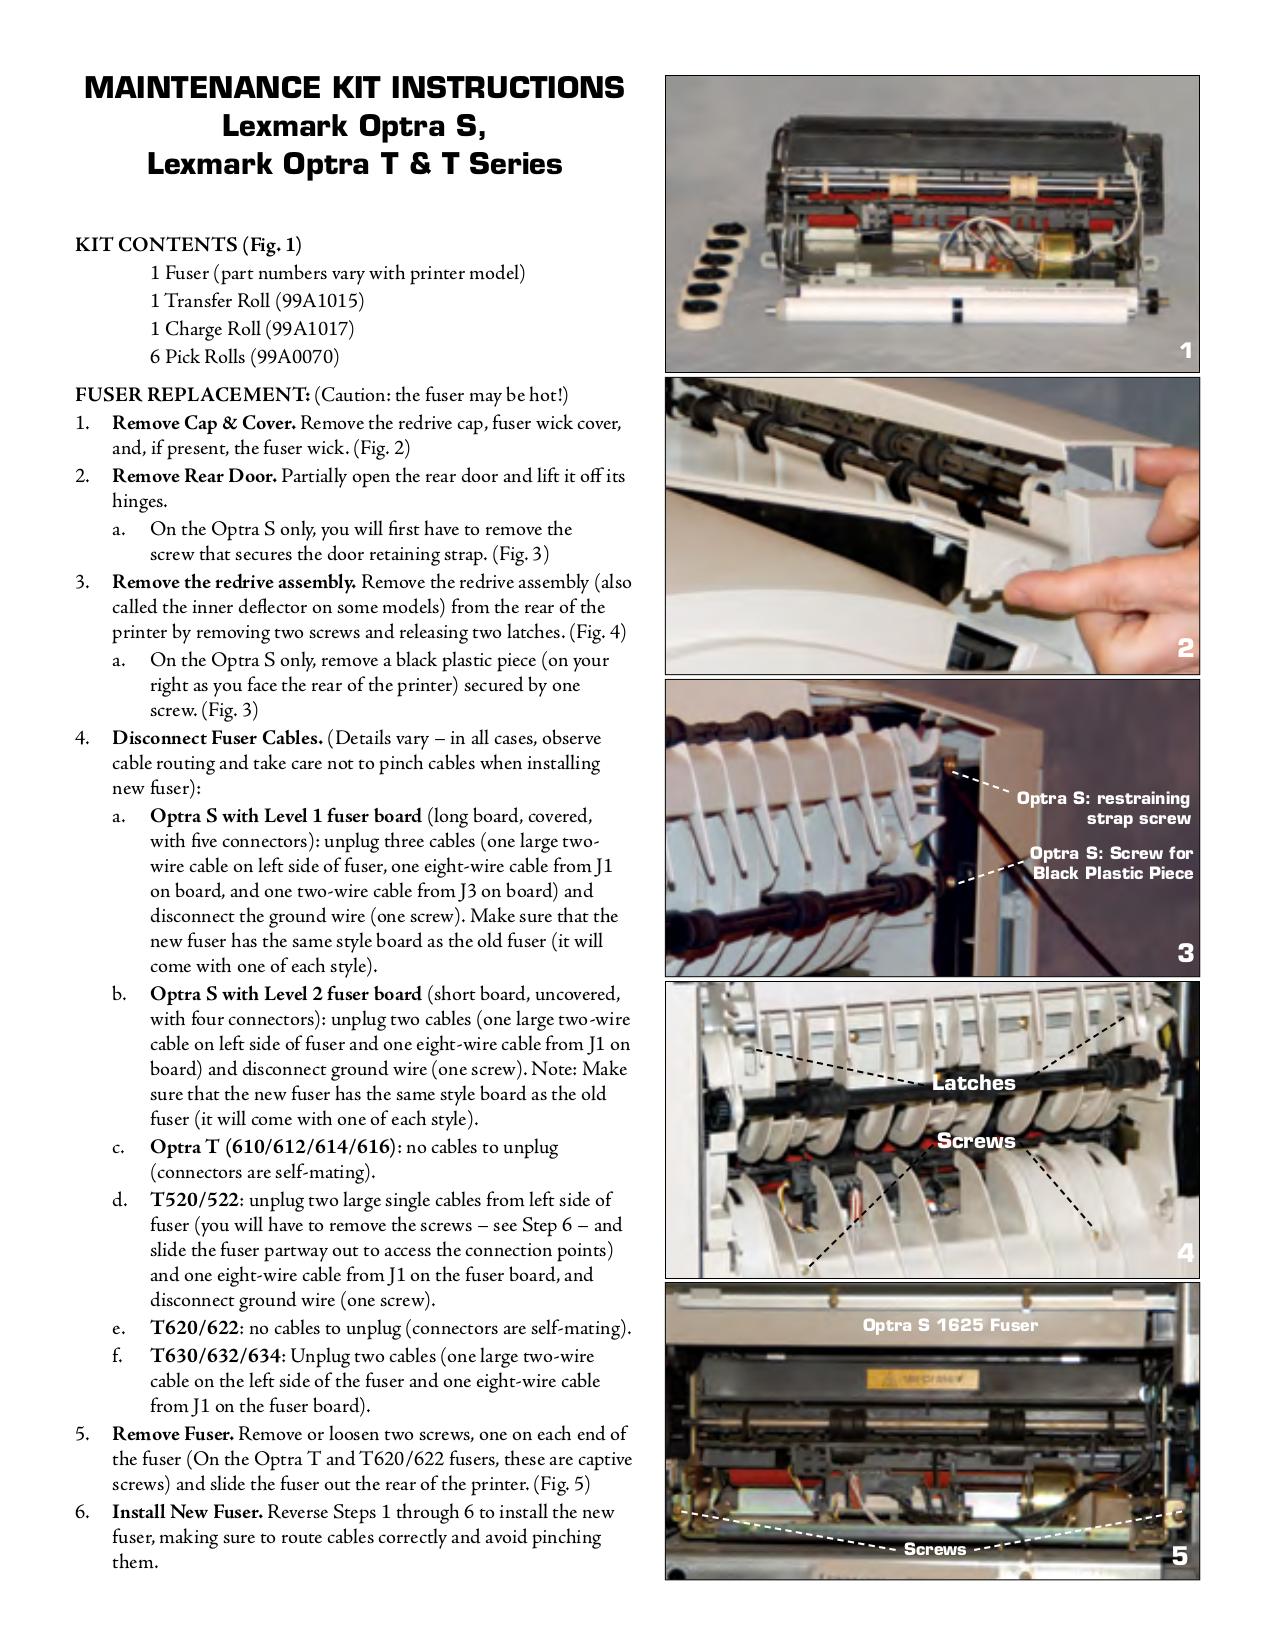 pdf for Lexmark Printer Optra T620 manual